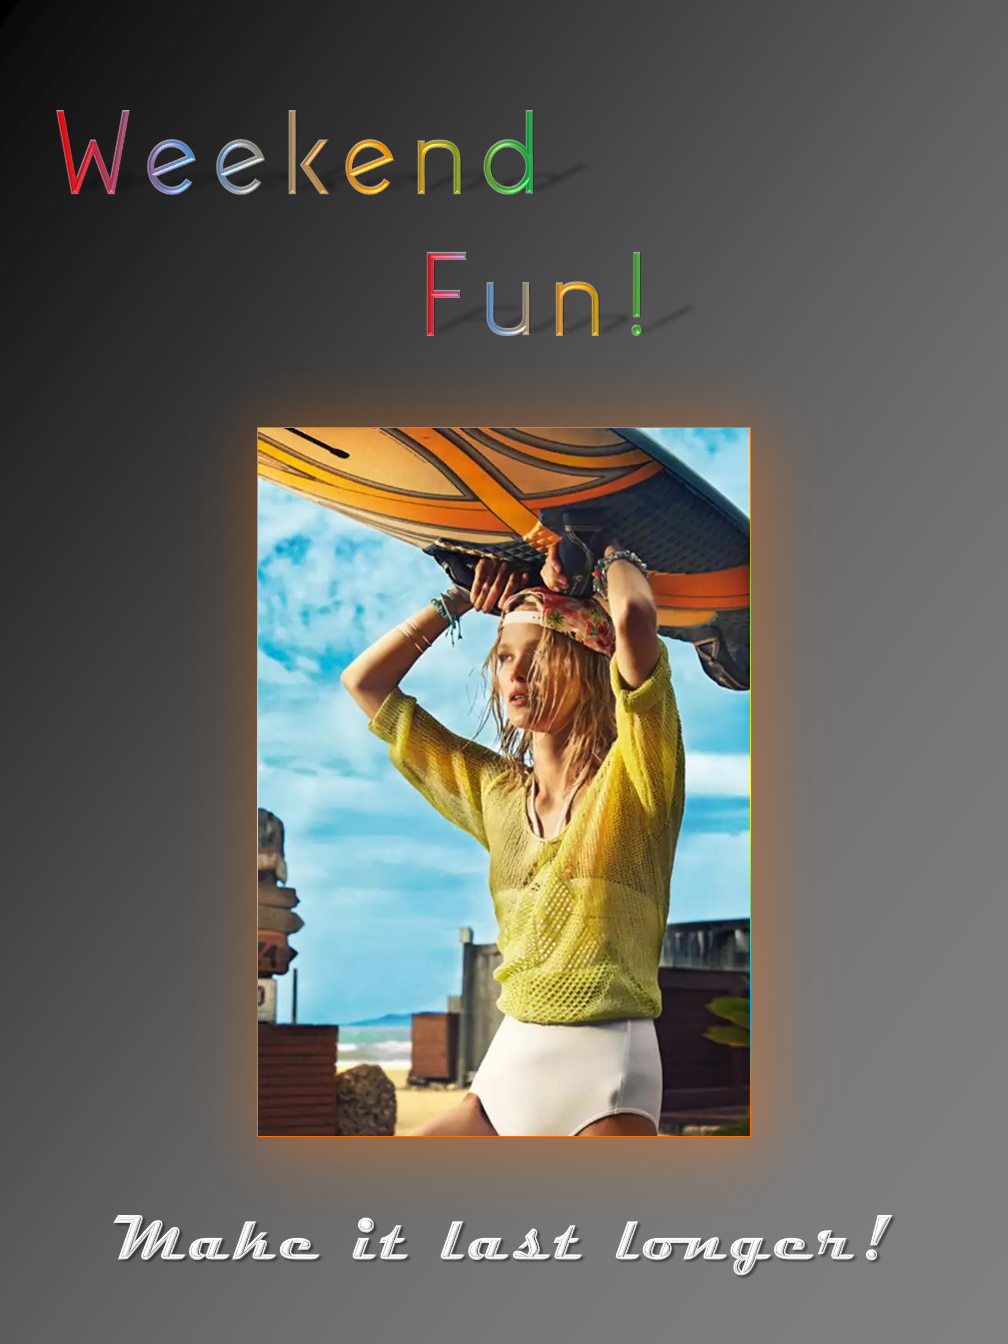 Weekend Fun!